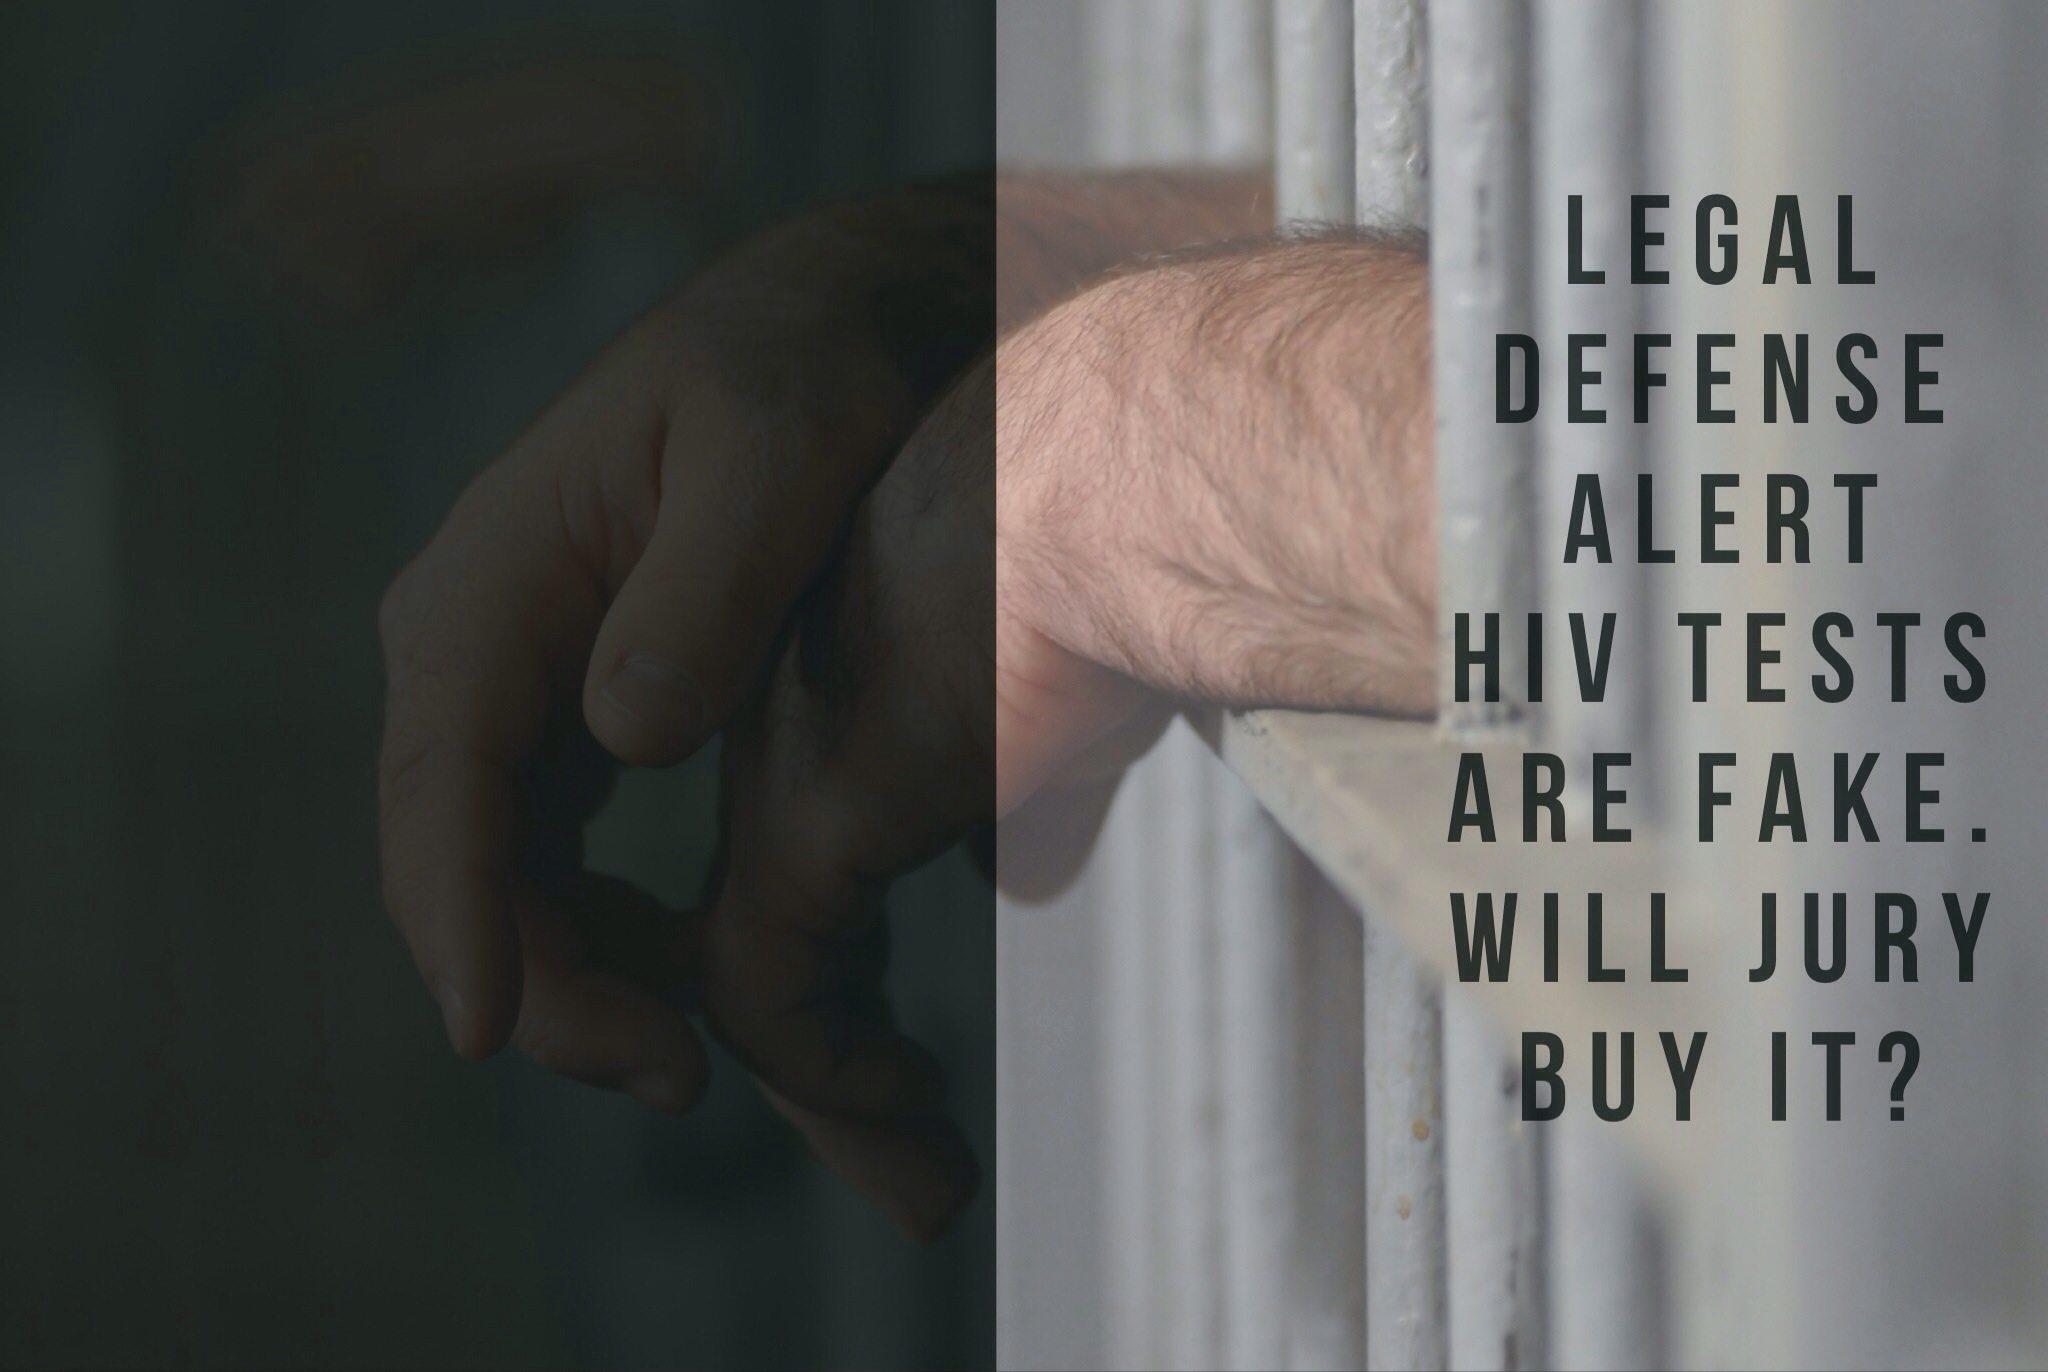 Legal Defense HIV